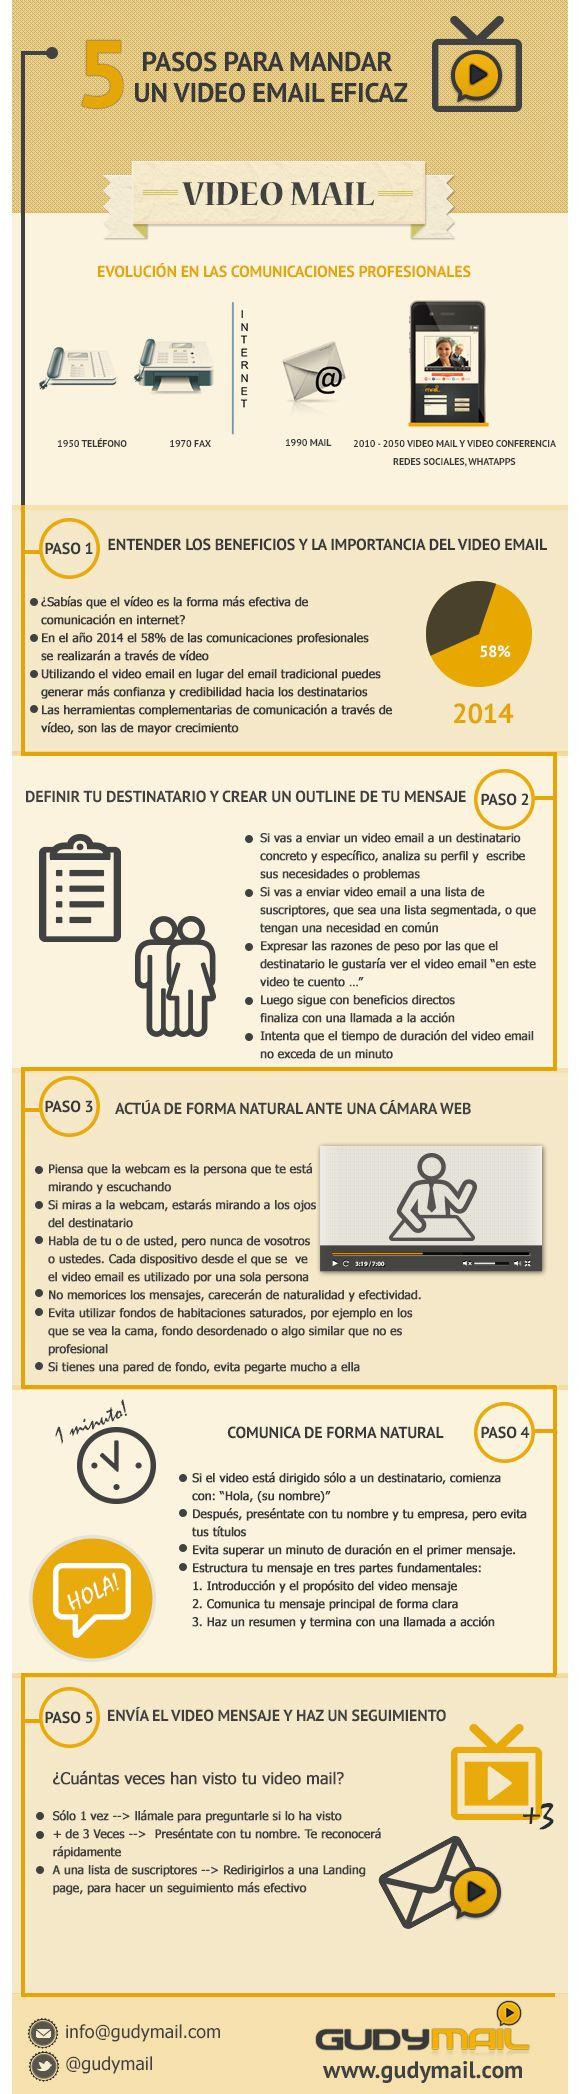 5 pasos para enviar un vídeo mail eficaz #infografia #infographic #marketing